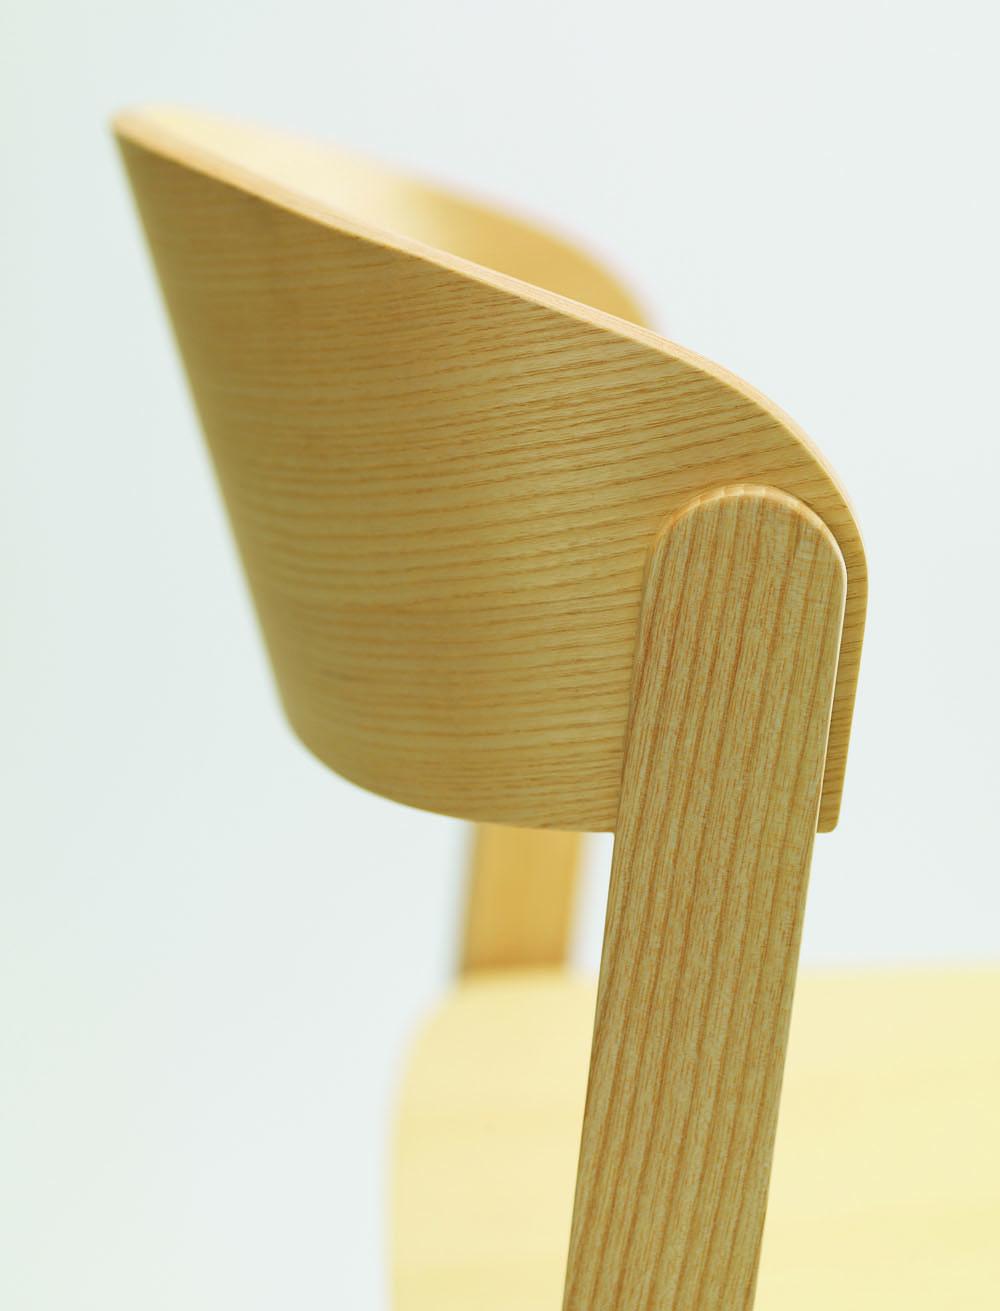 While the chair, detail